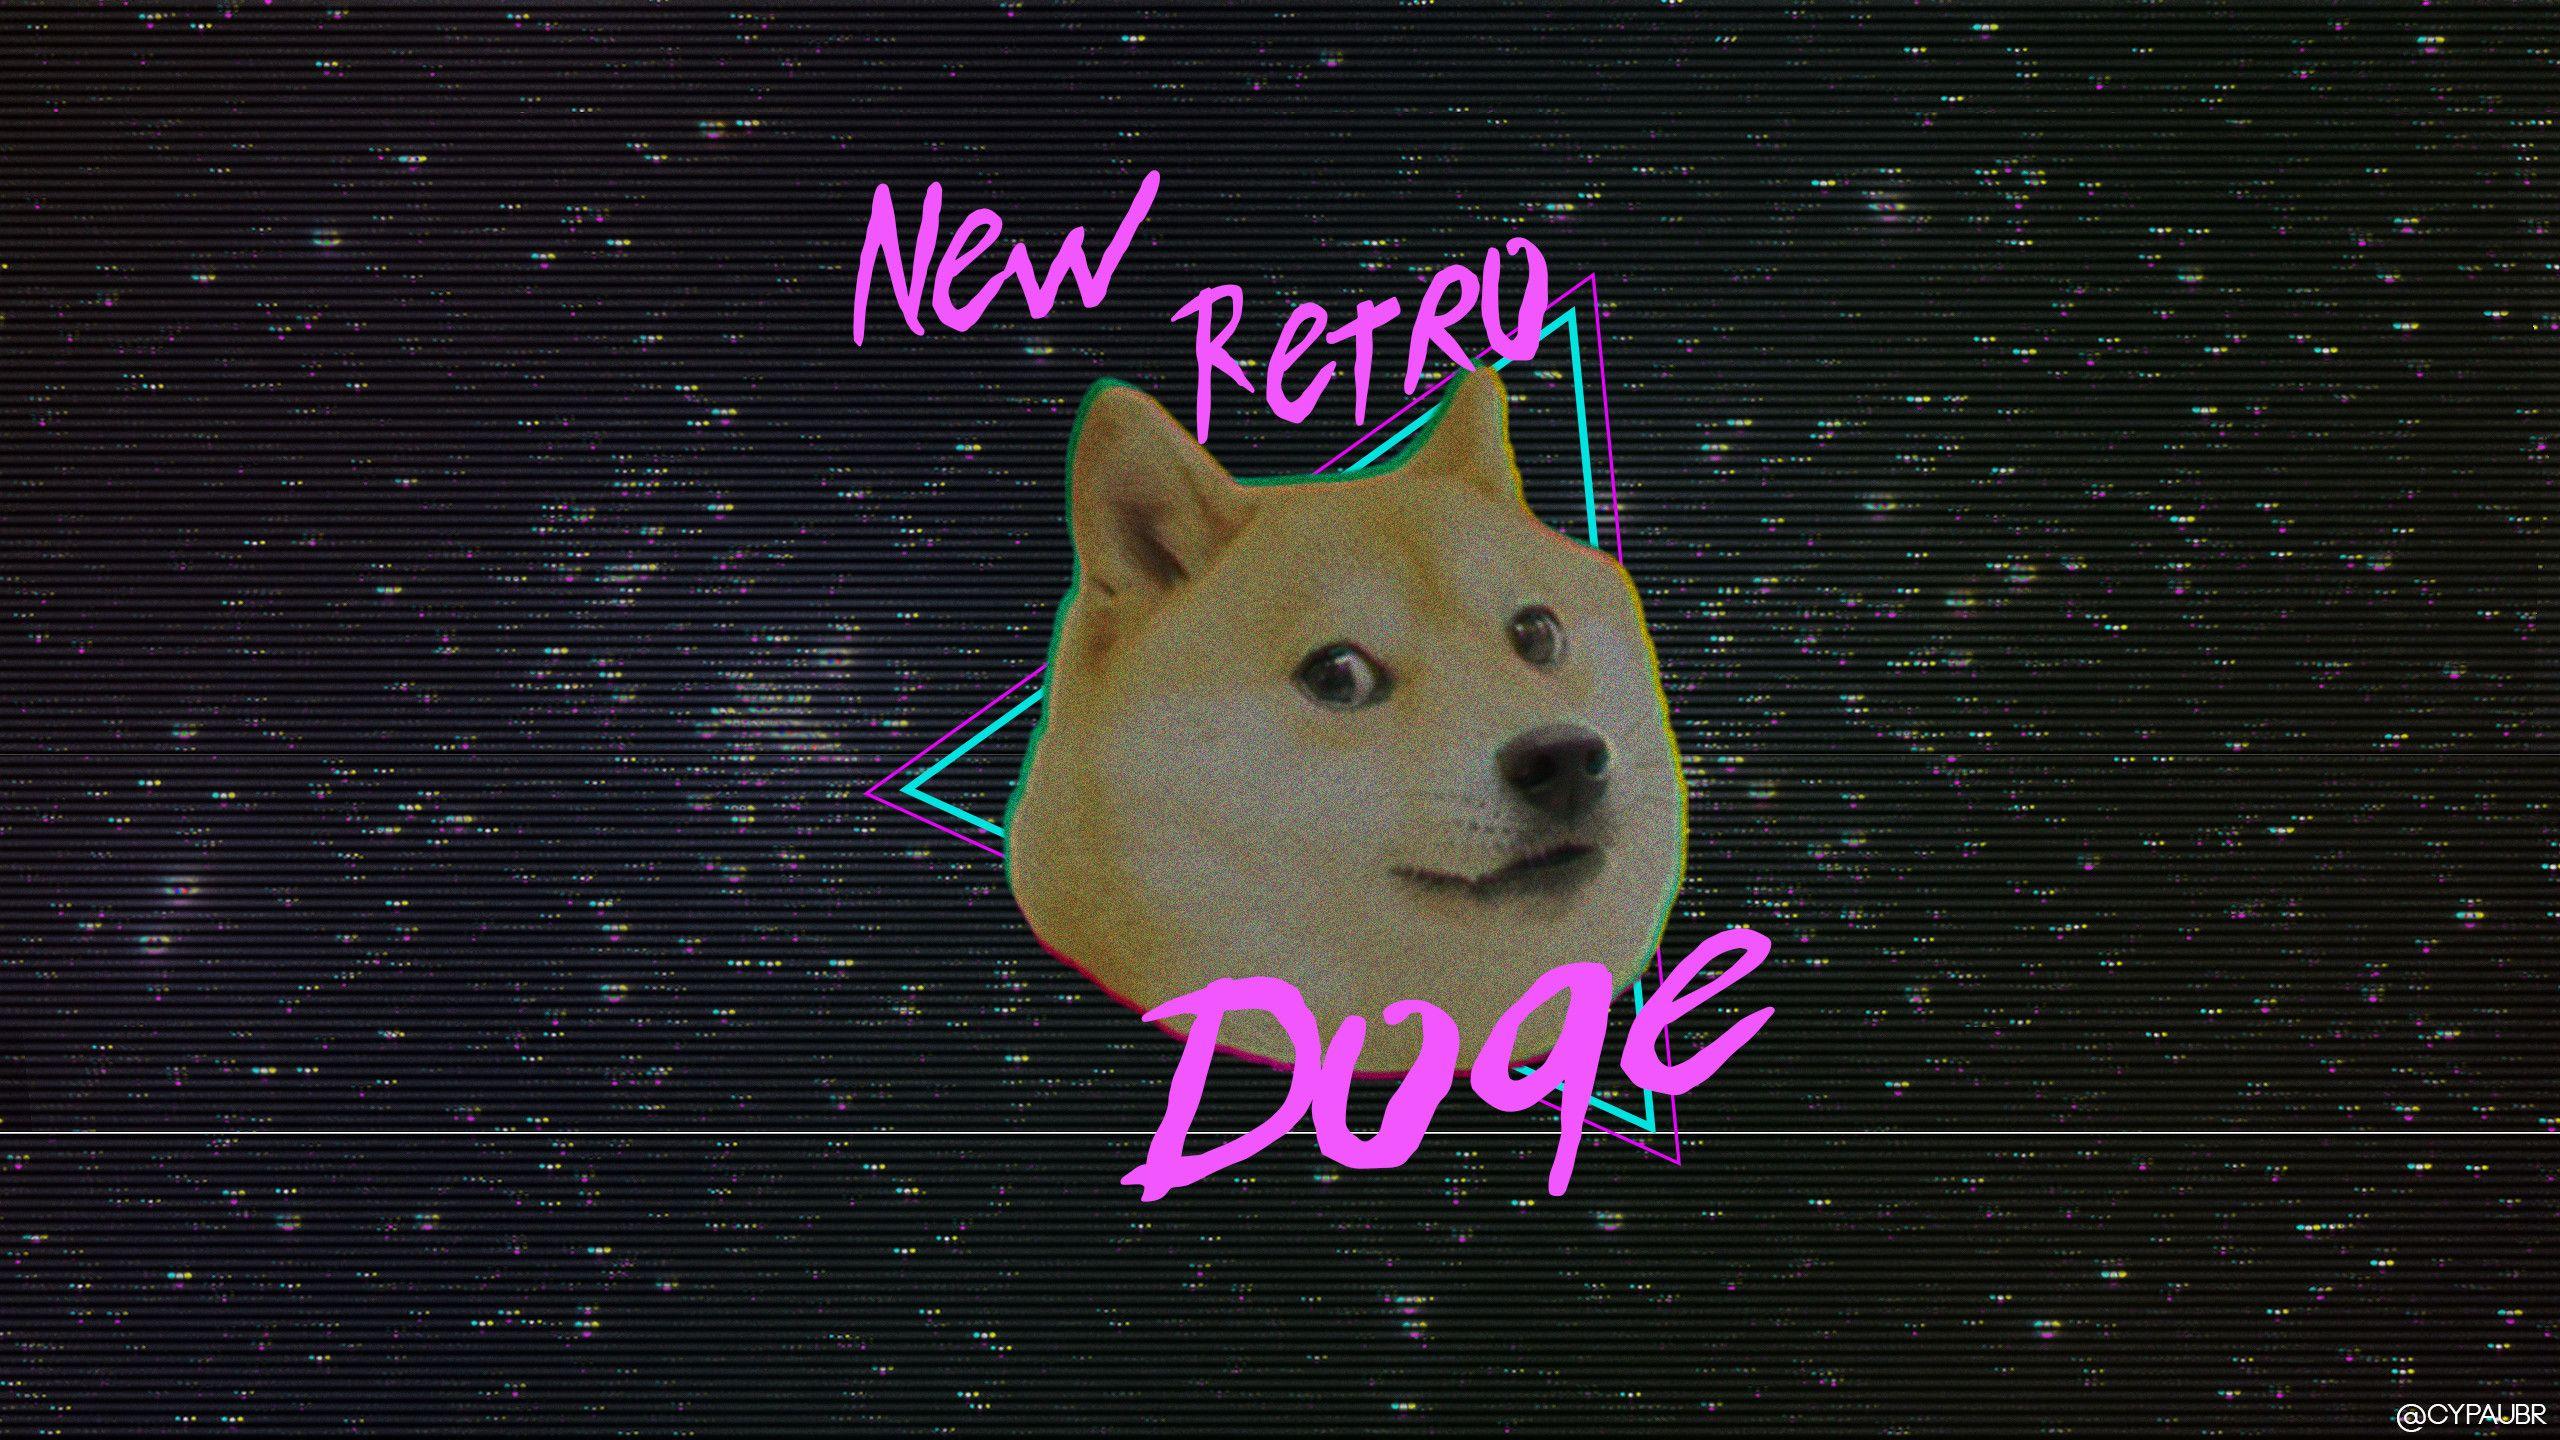 Dog Meme Wallpapers   Top Dog Meme Backgrounds   WallpaperAccess 2560x1440